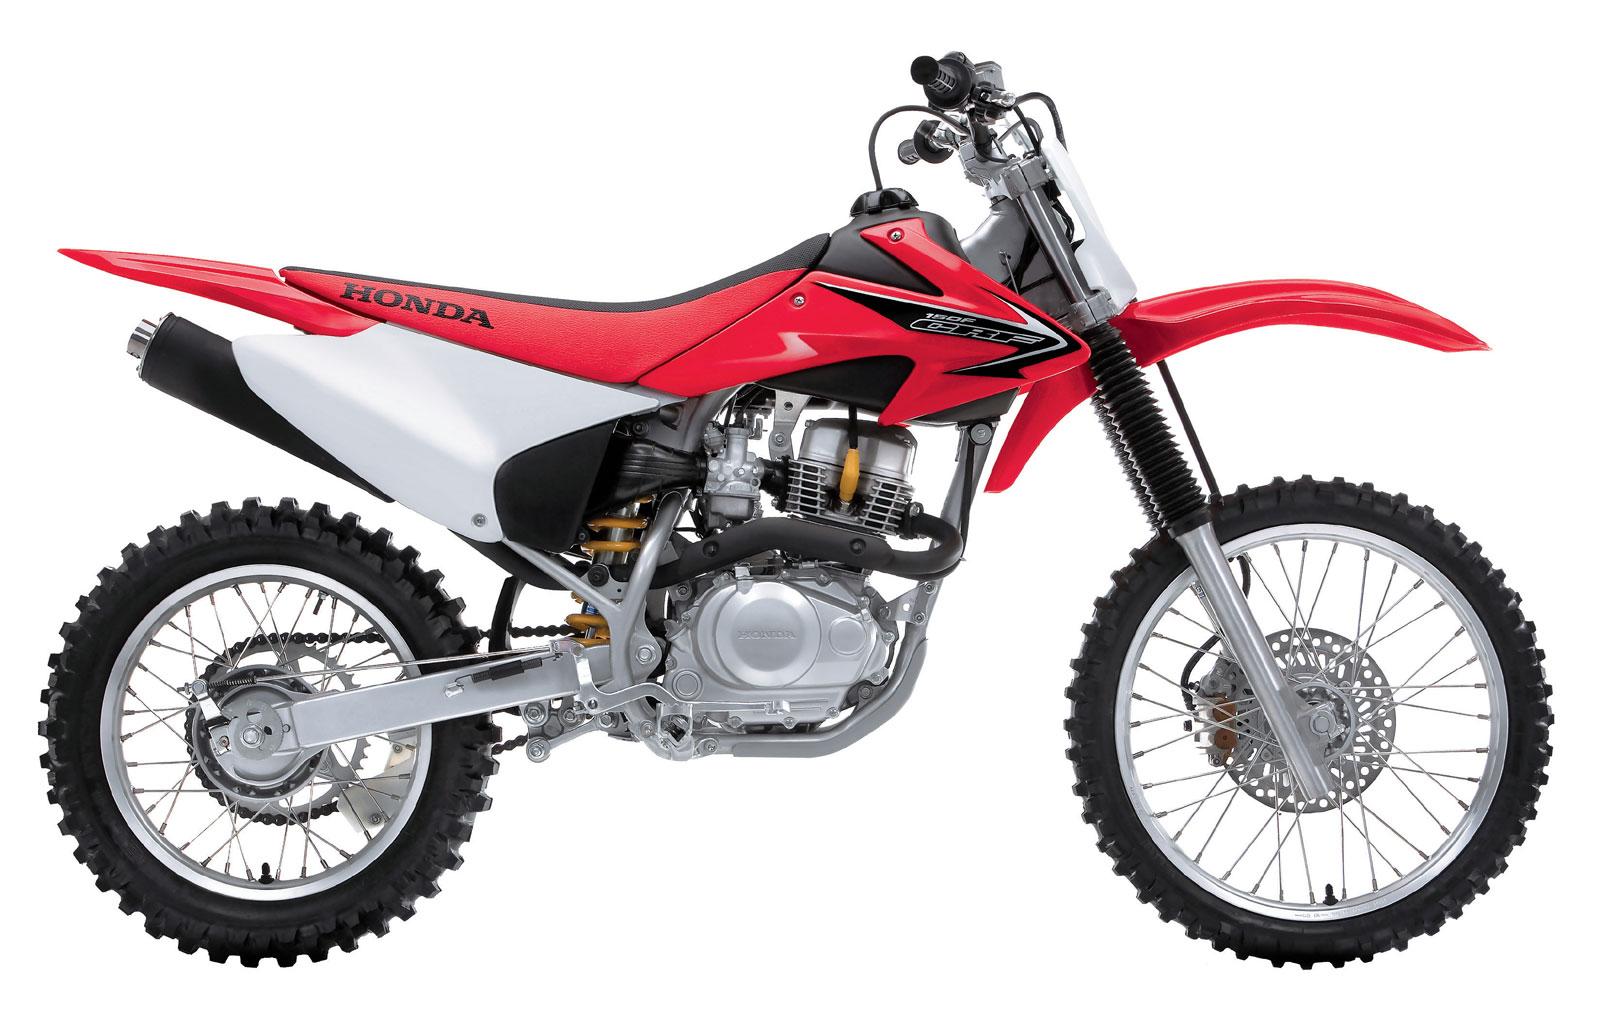 Spesifikasi Dan Harga Motor Honda CRF 150cc Dan 250 Baru Dan Bekas